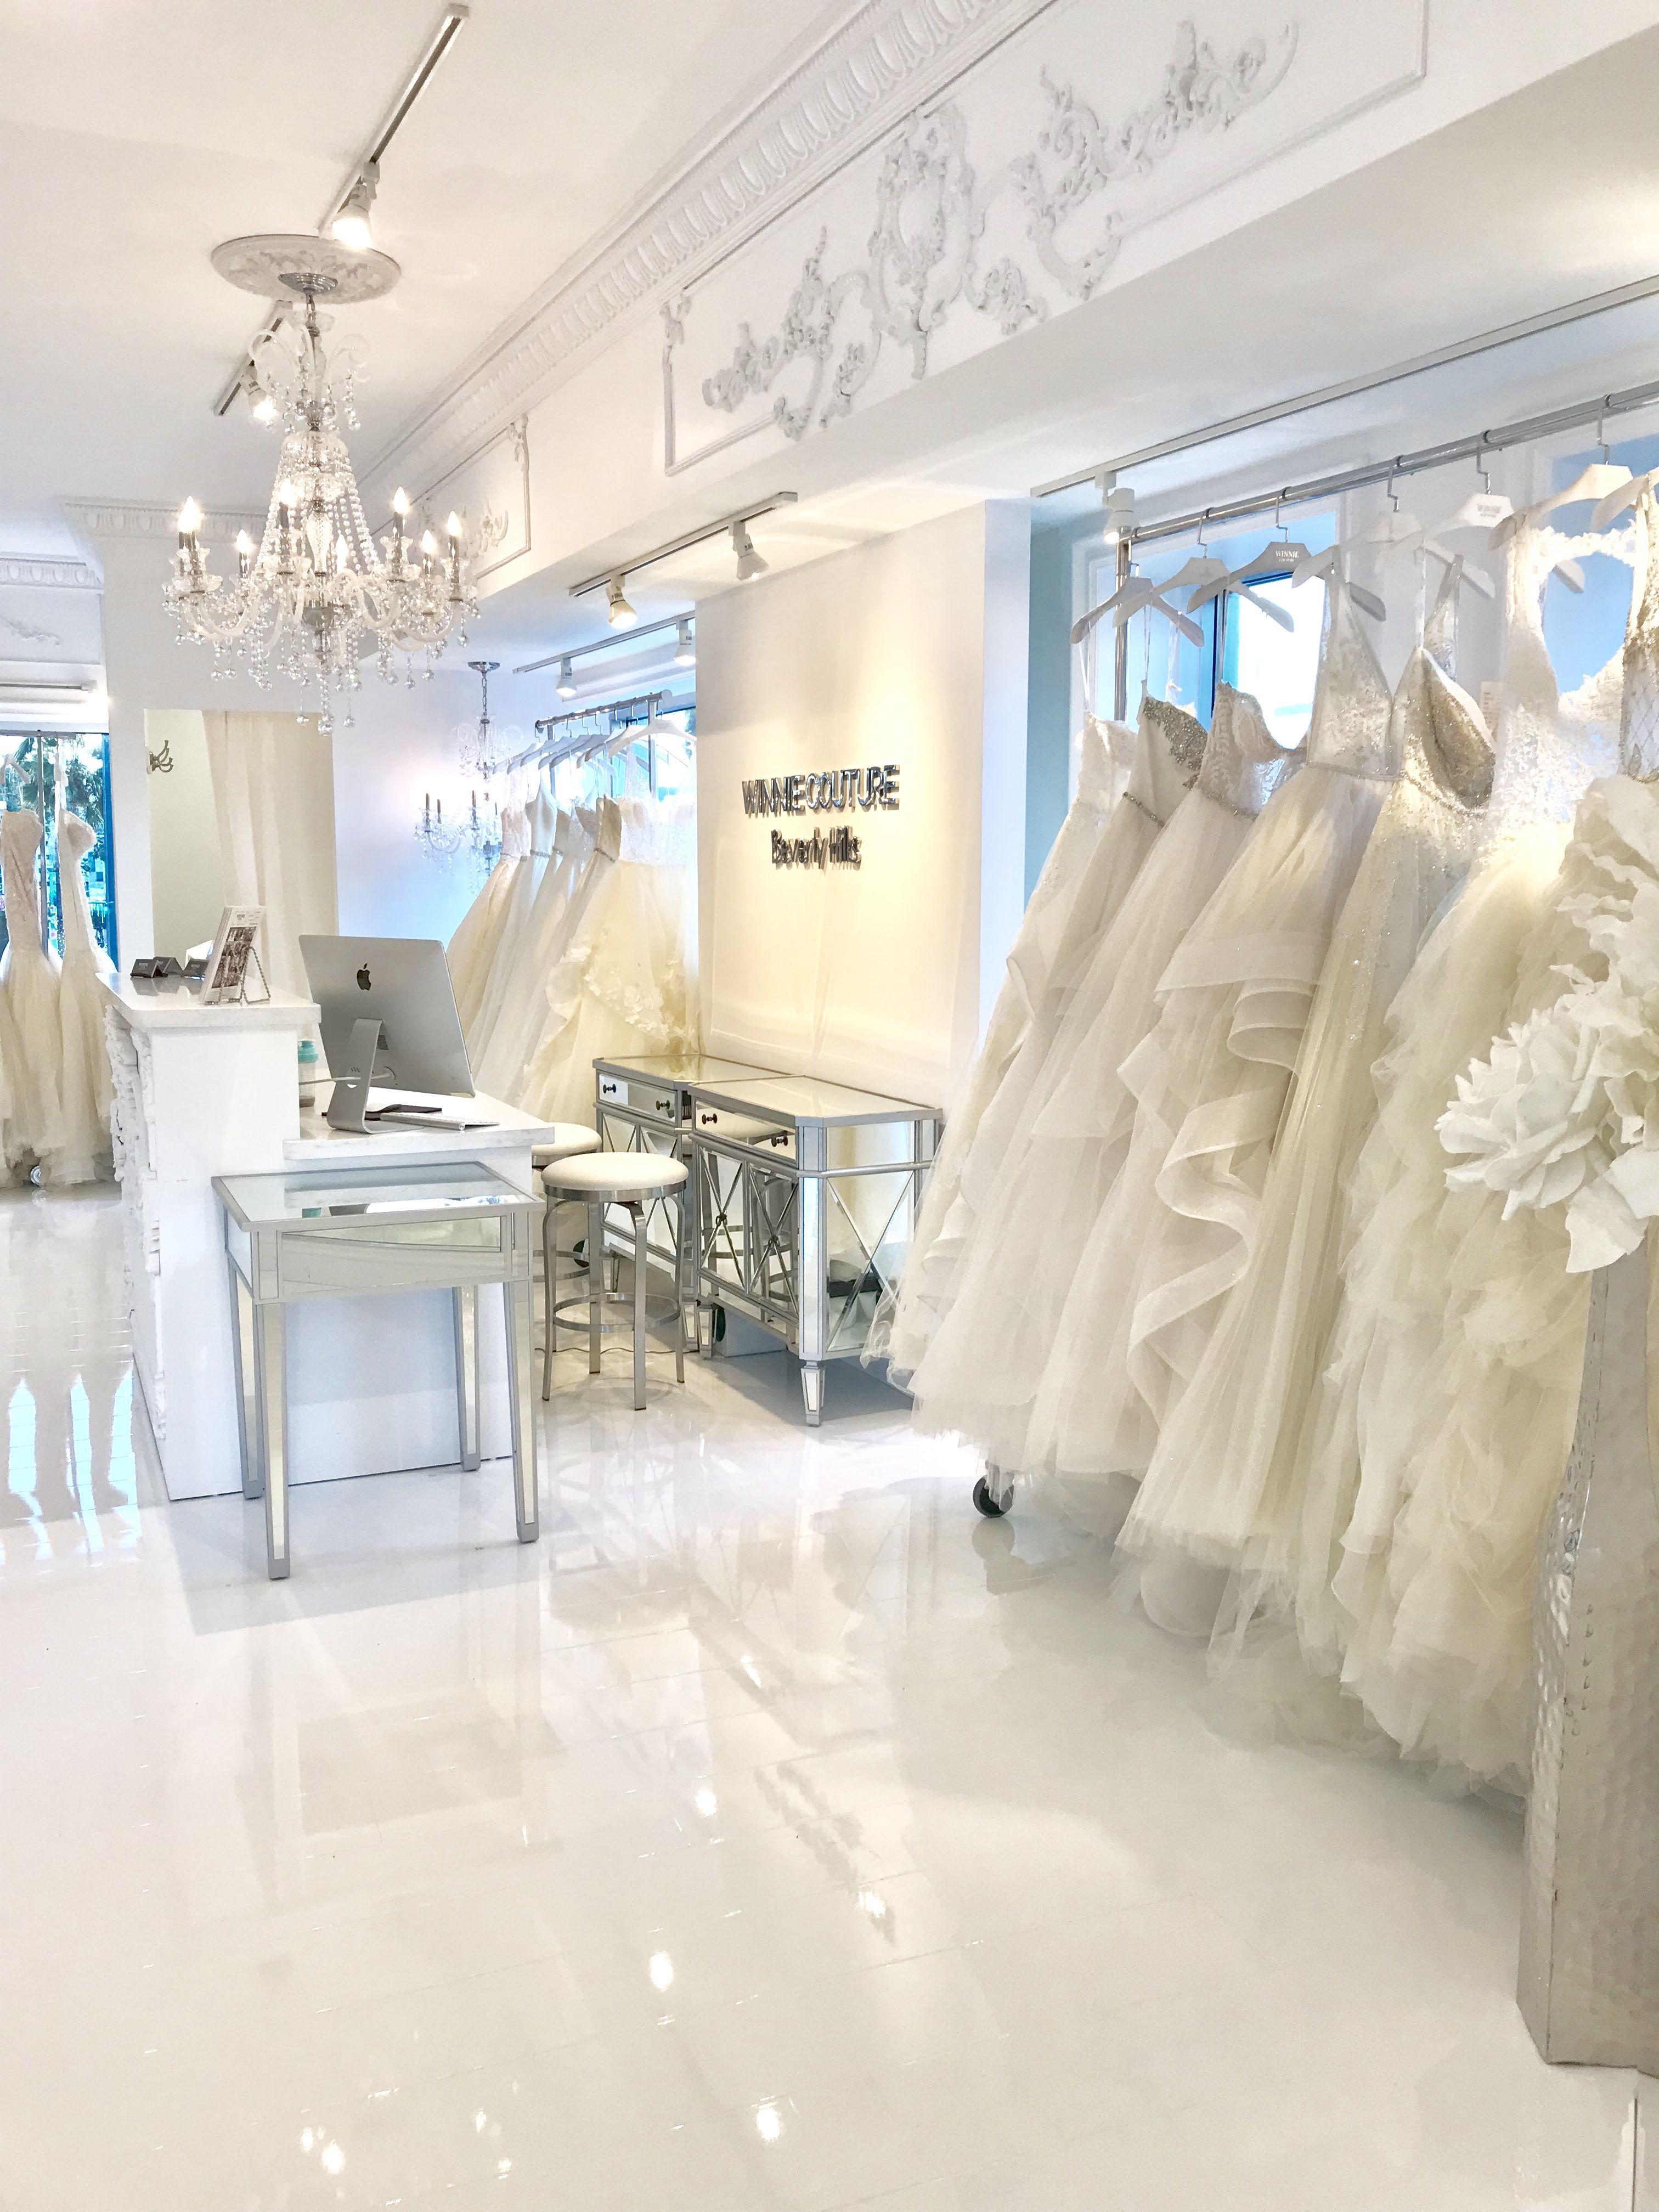 Beverly Hills La Flagship Bridal Shop Winnie Couture Wedding Dress Bridal Shop Interior Bridal Boutique Interior Store Design Interior